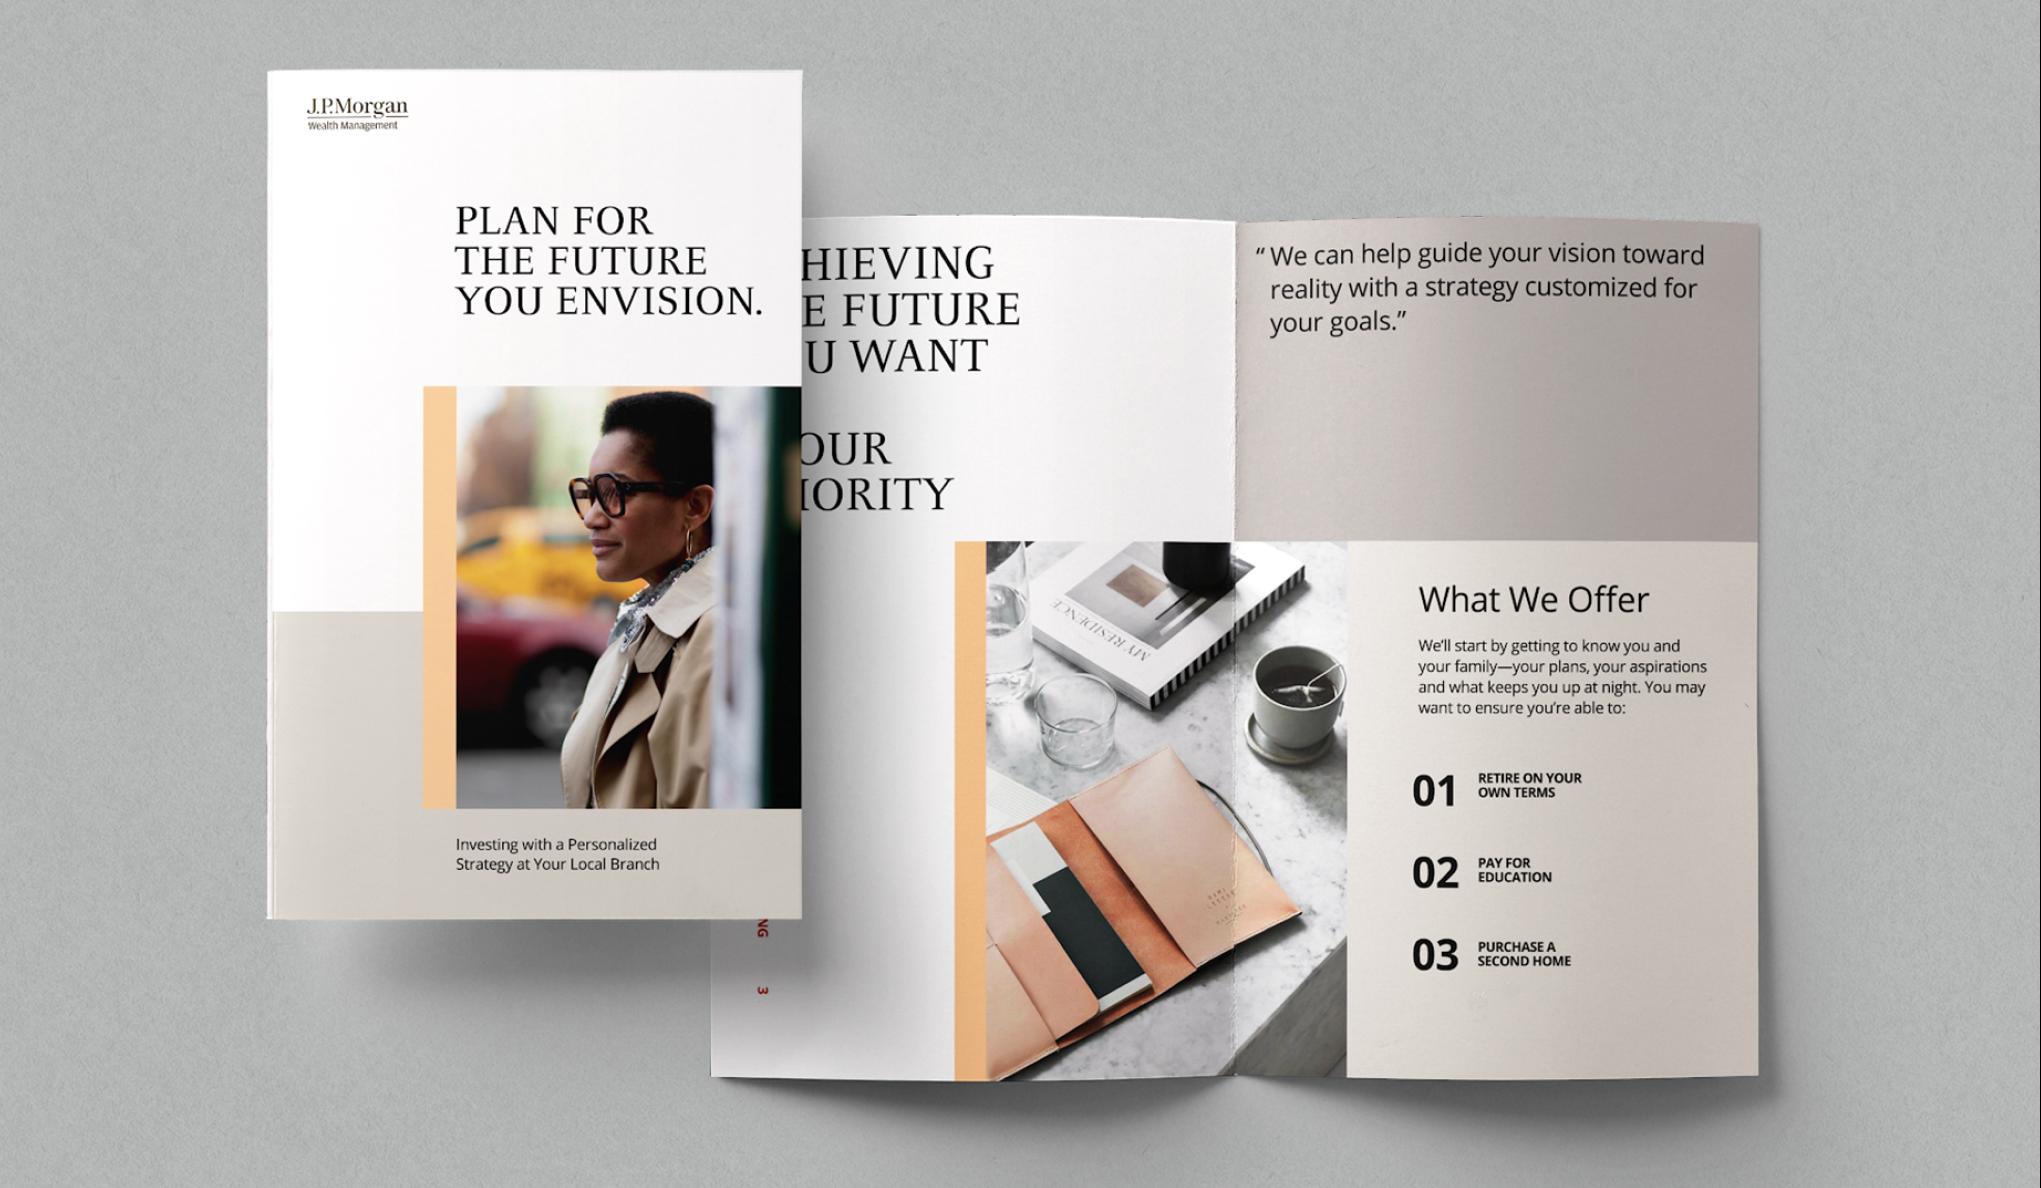 JPM_IMG_Final_Brochure